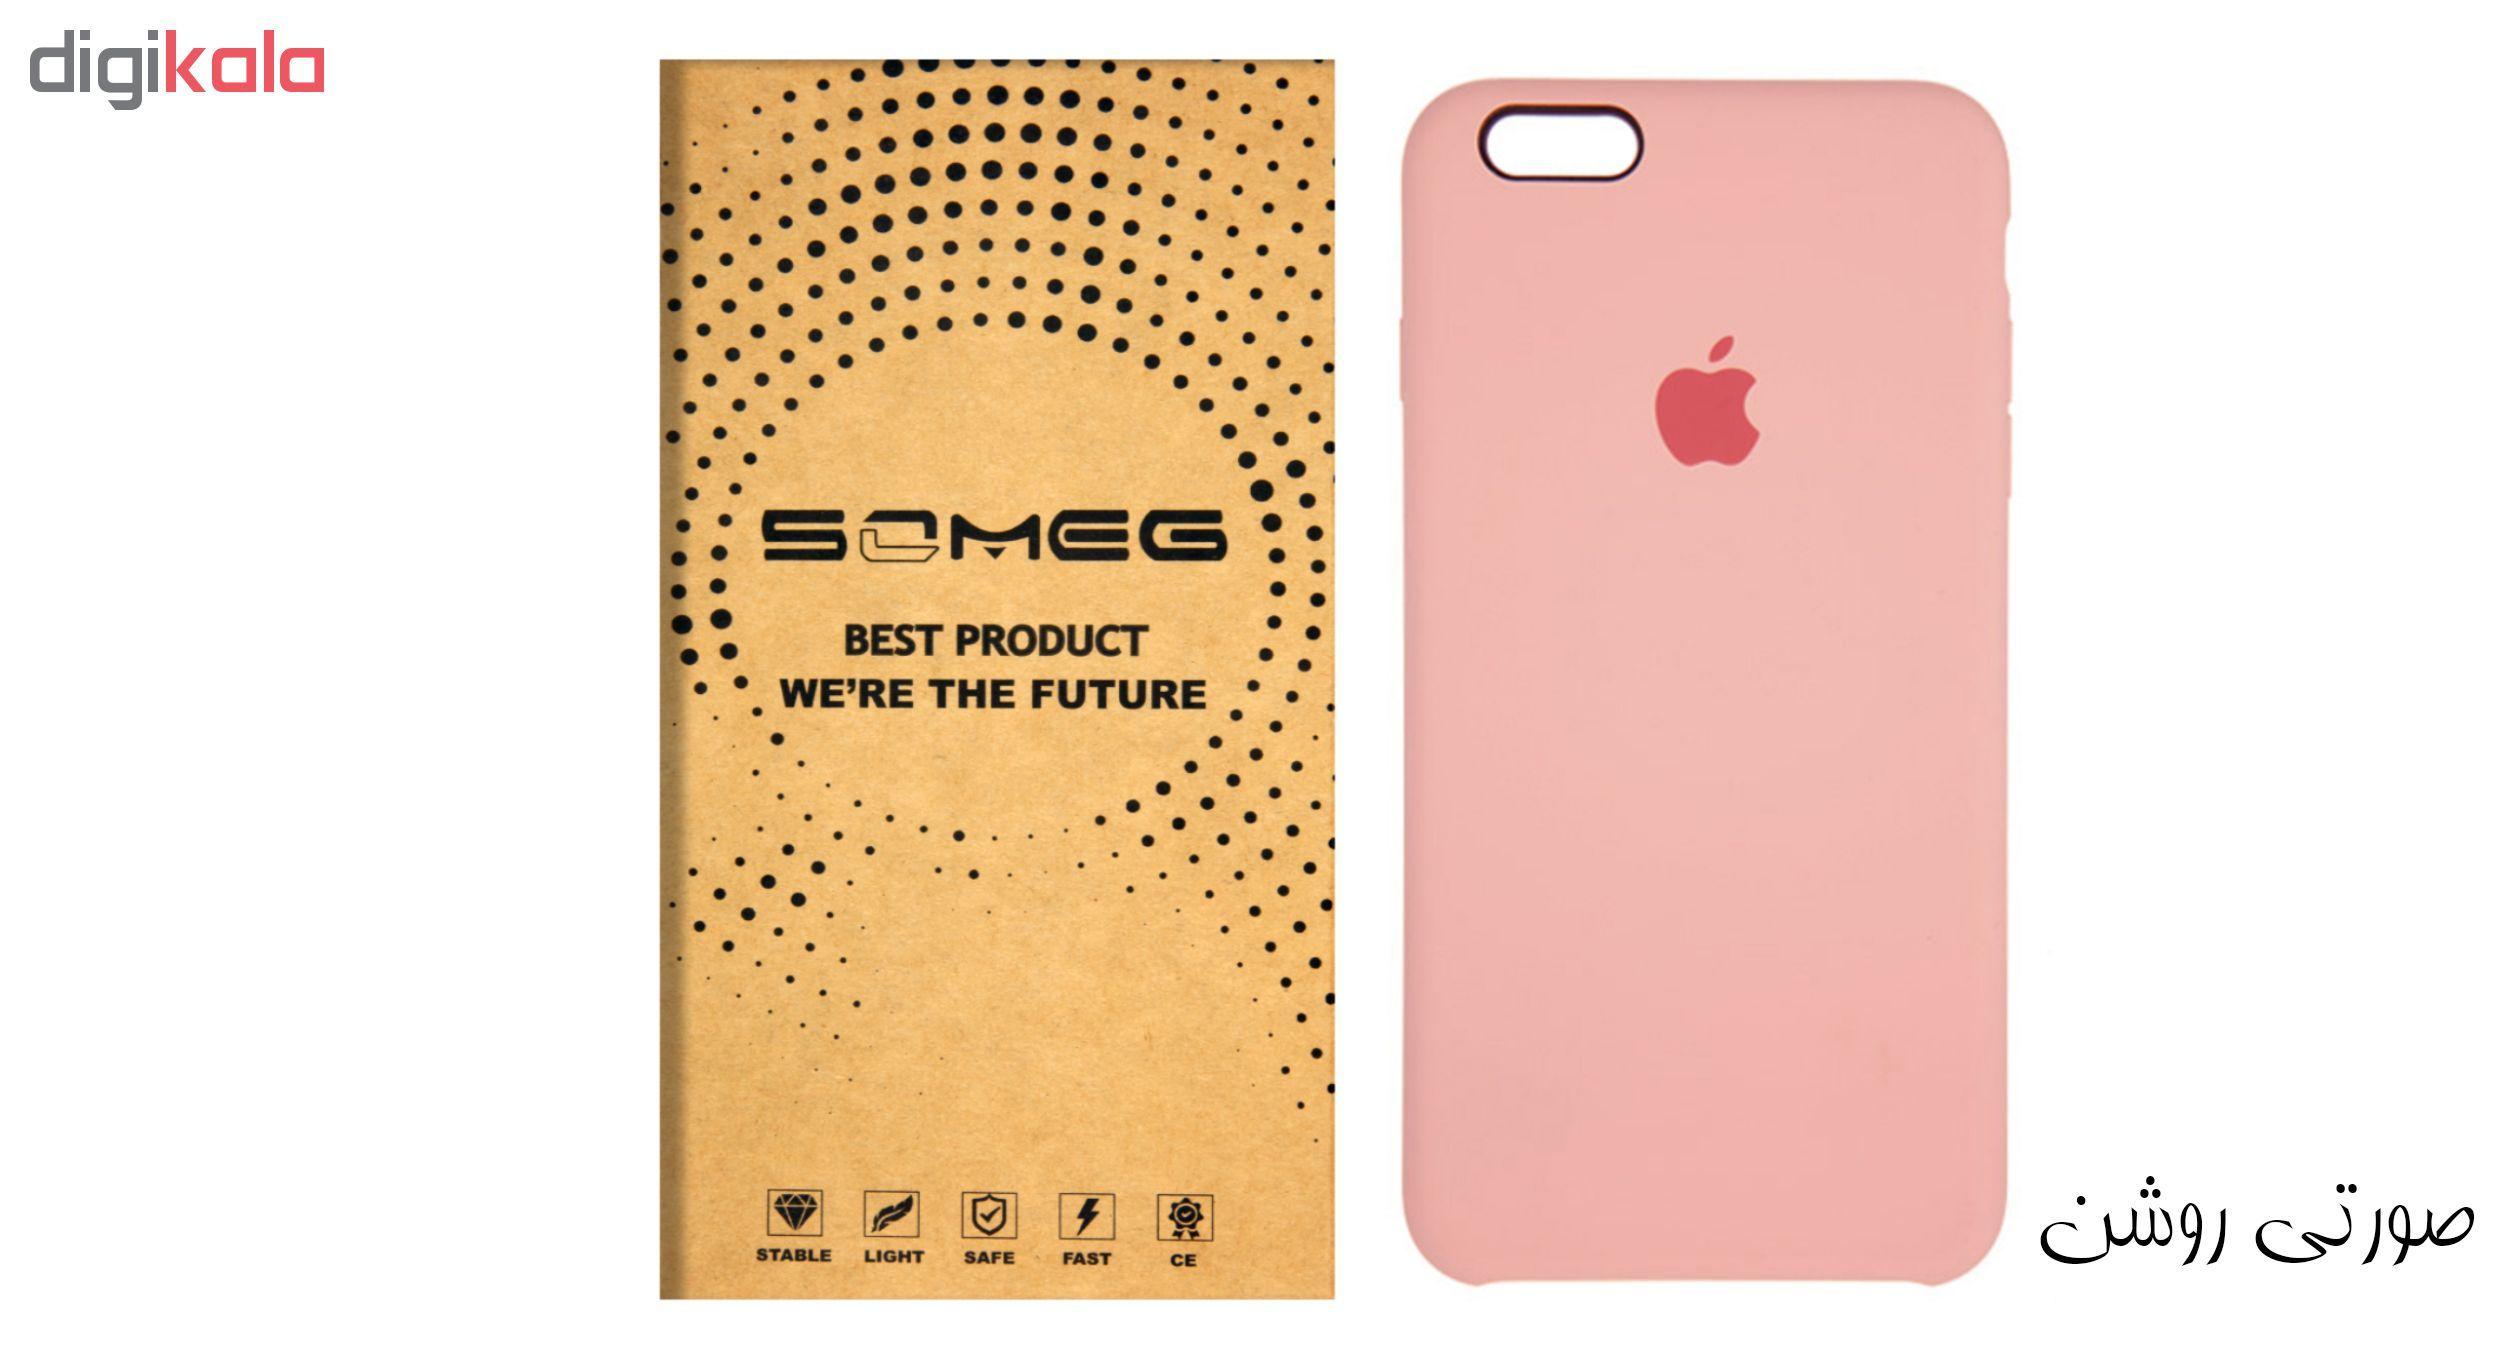 کاور سومگ مدل SIC مناسب برای گوشی موبایل اپل iPhone 6/6s main 1 20